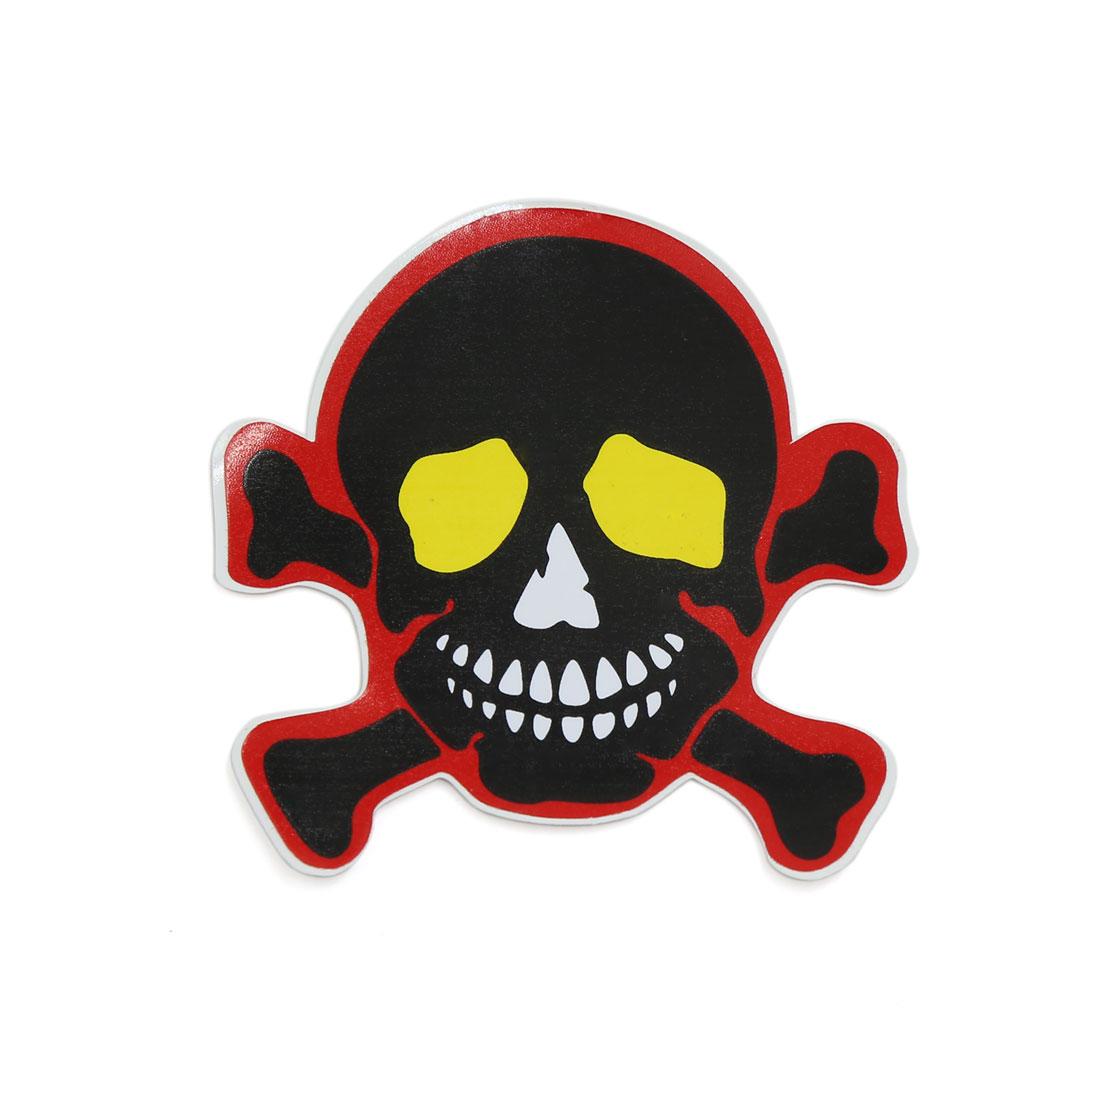 Black Red Yellow White Skull Head Self Adhesive Car Decorative Sticker 10pcs